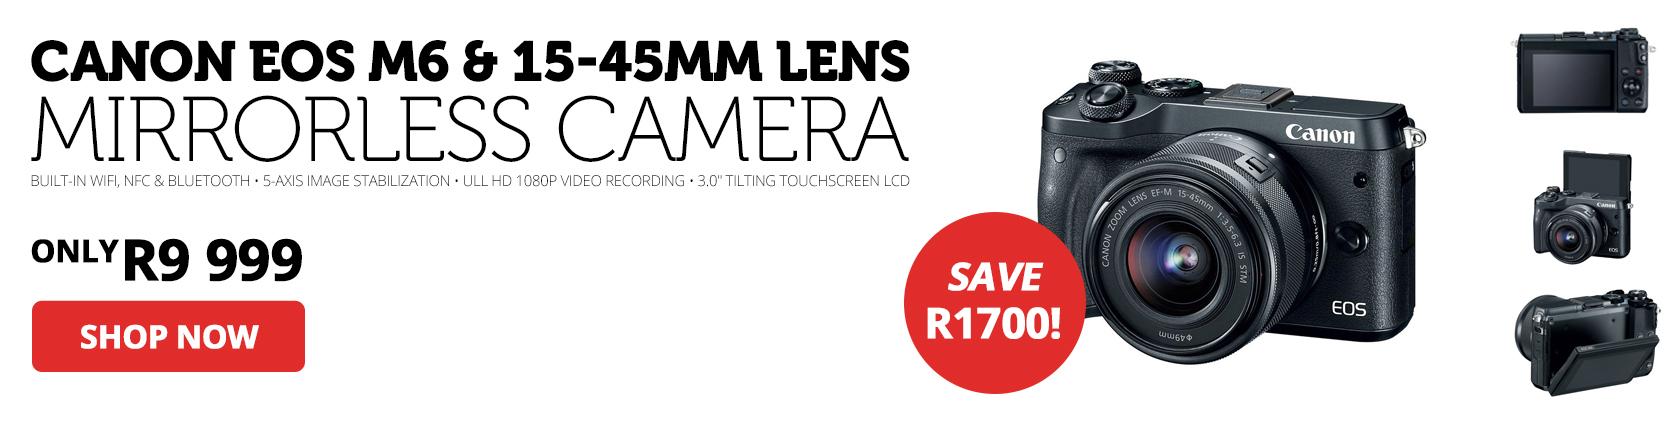 Canon EOS M6 Mirrorless Digital Camera & 15-45mm Lens